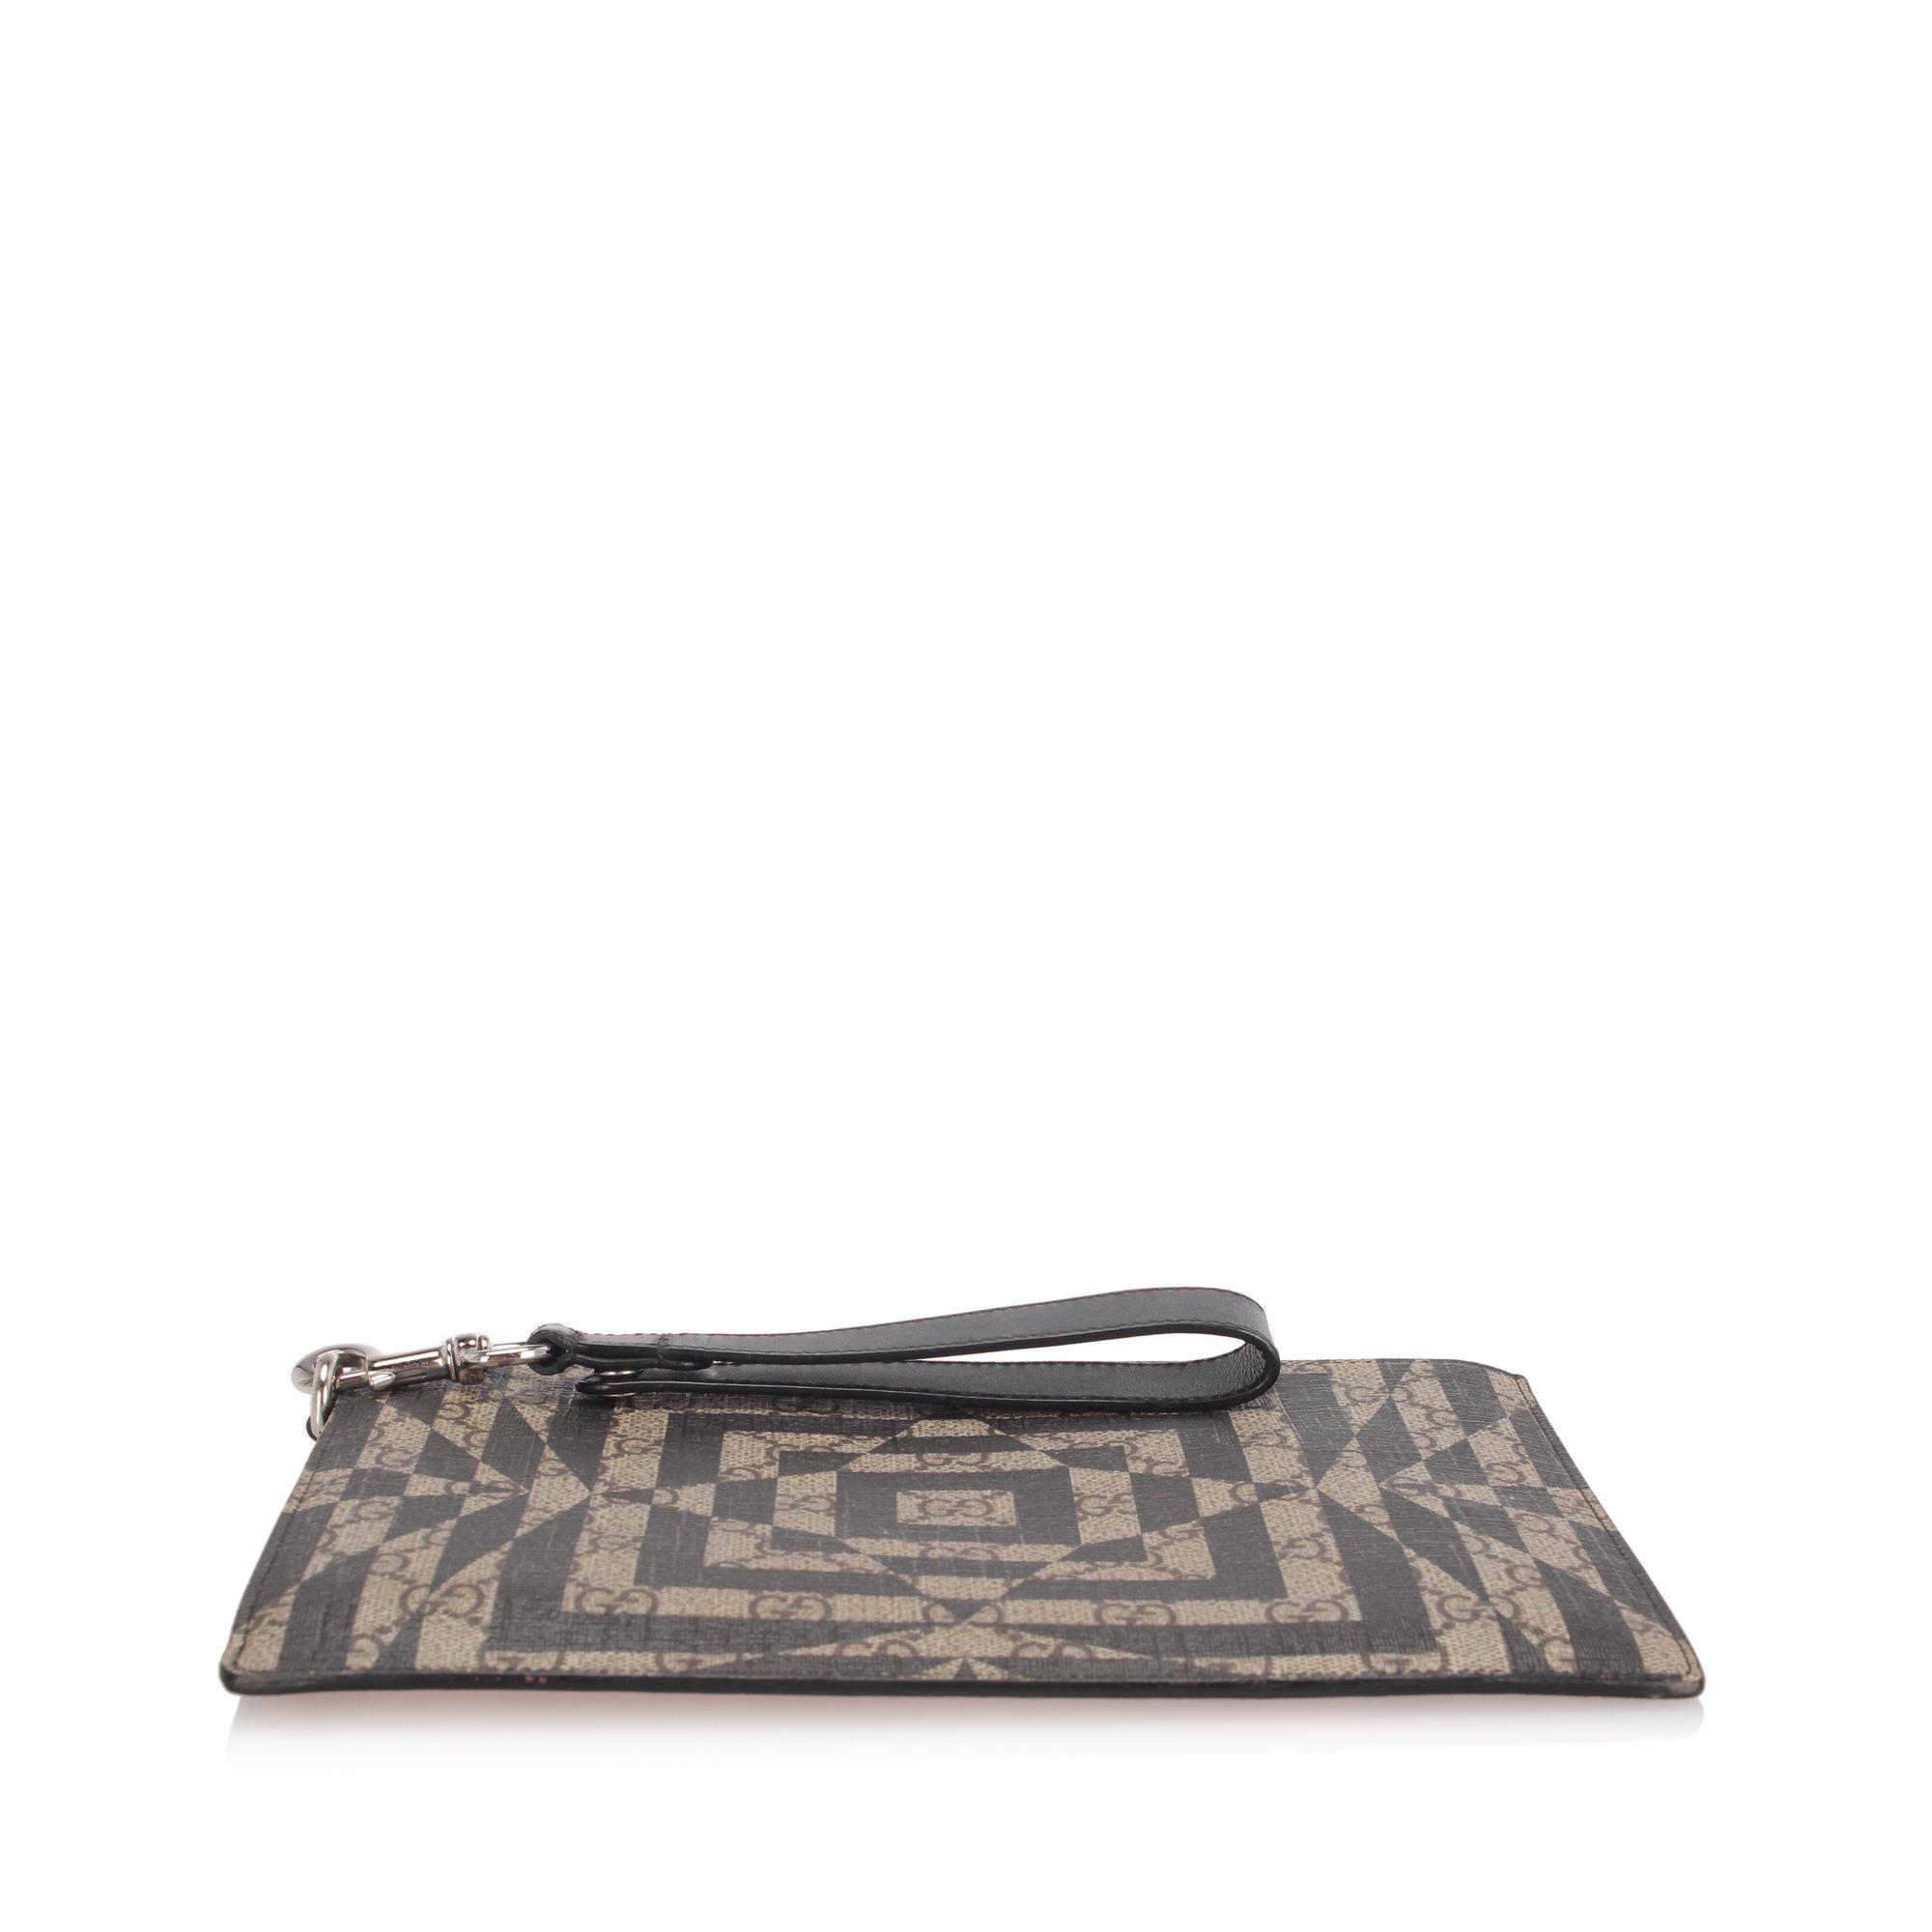 Vintage Gucci GG Supreme Caleido Clutch Bag Brown